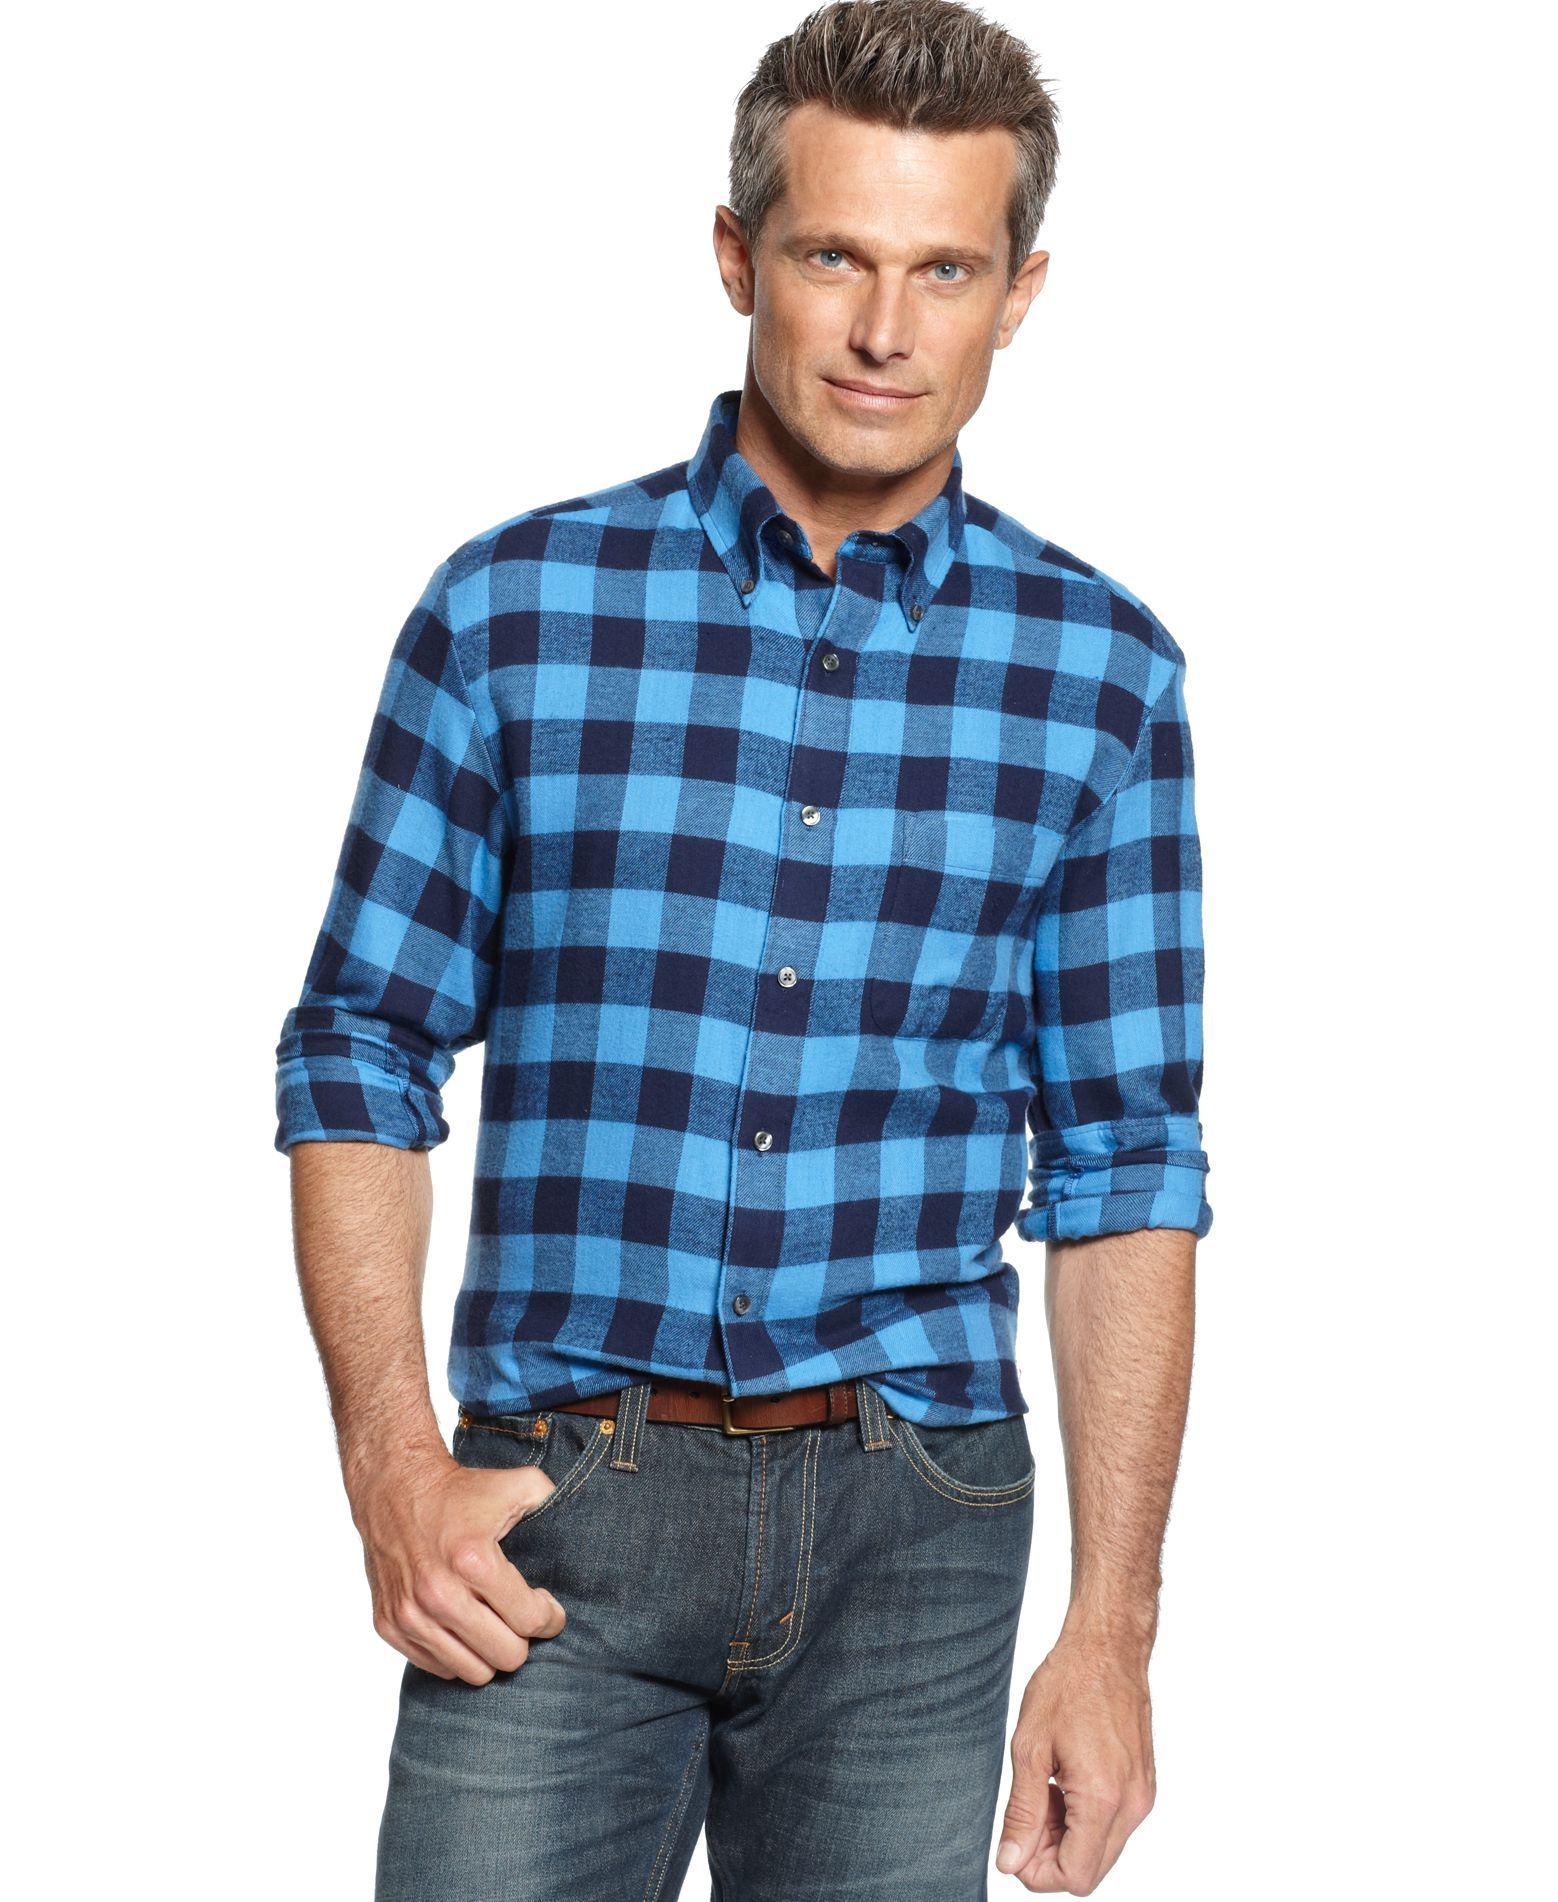 Red flannel vest womens  John Ashford Big and Tall BuffaloPlaid Flannel Shirt  Products